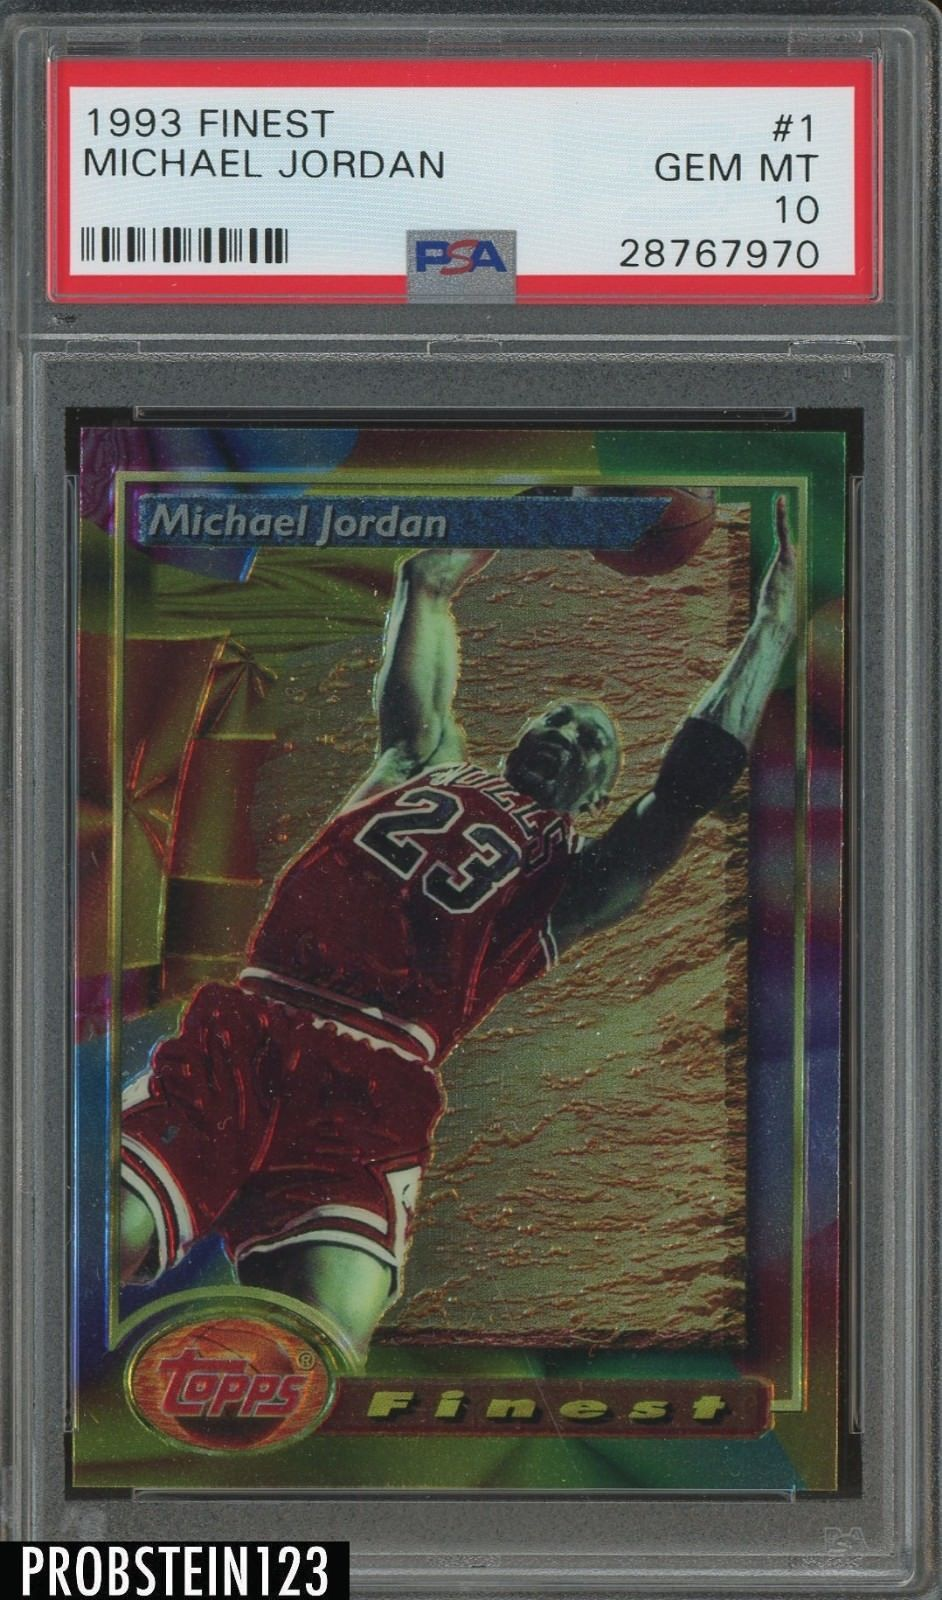 1993 finest 1 michael jordan chicago bulls psa 10 gem